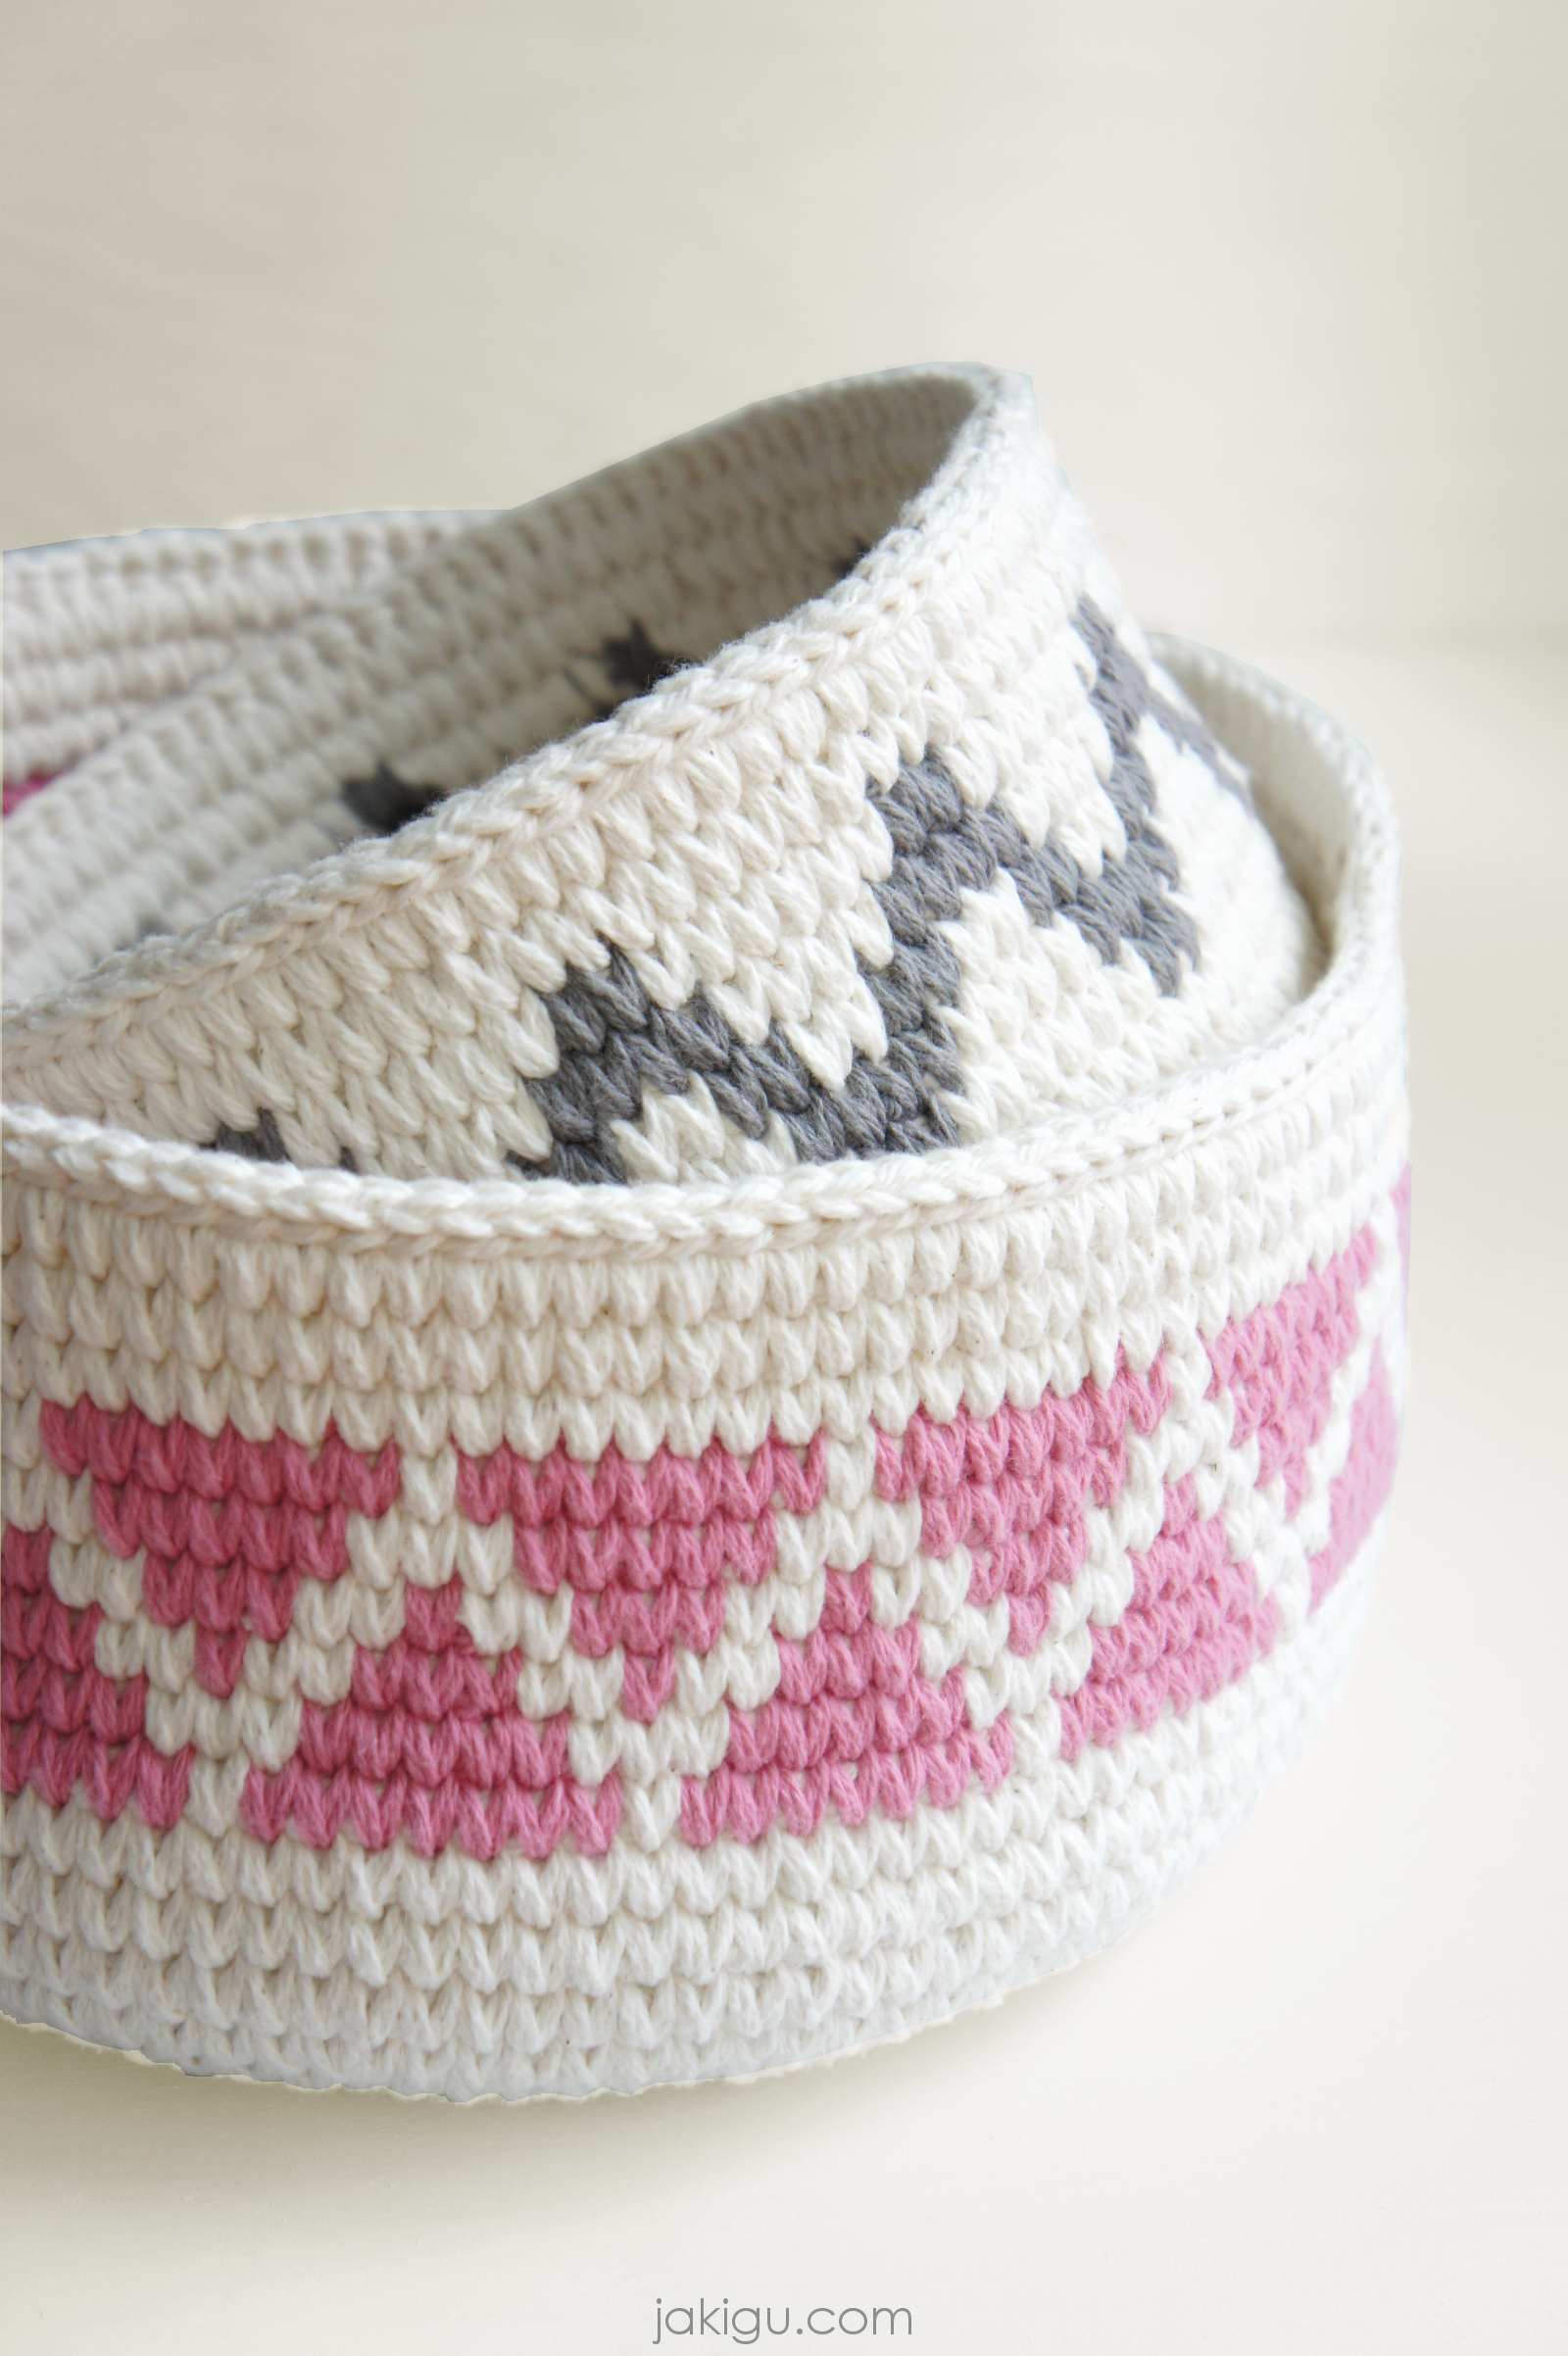 2+1 Sale! Crochet Baskets Pattern Bundle by jakigu.com